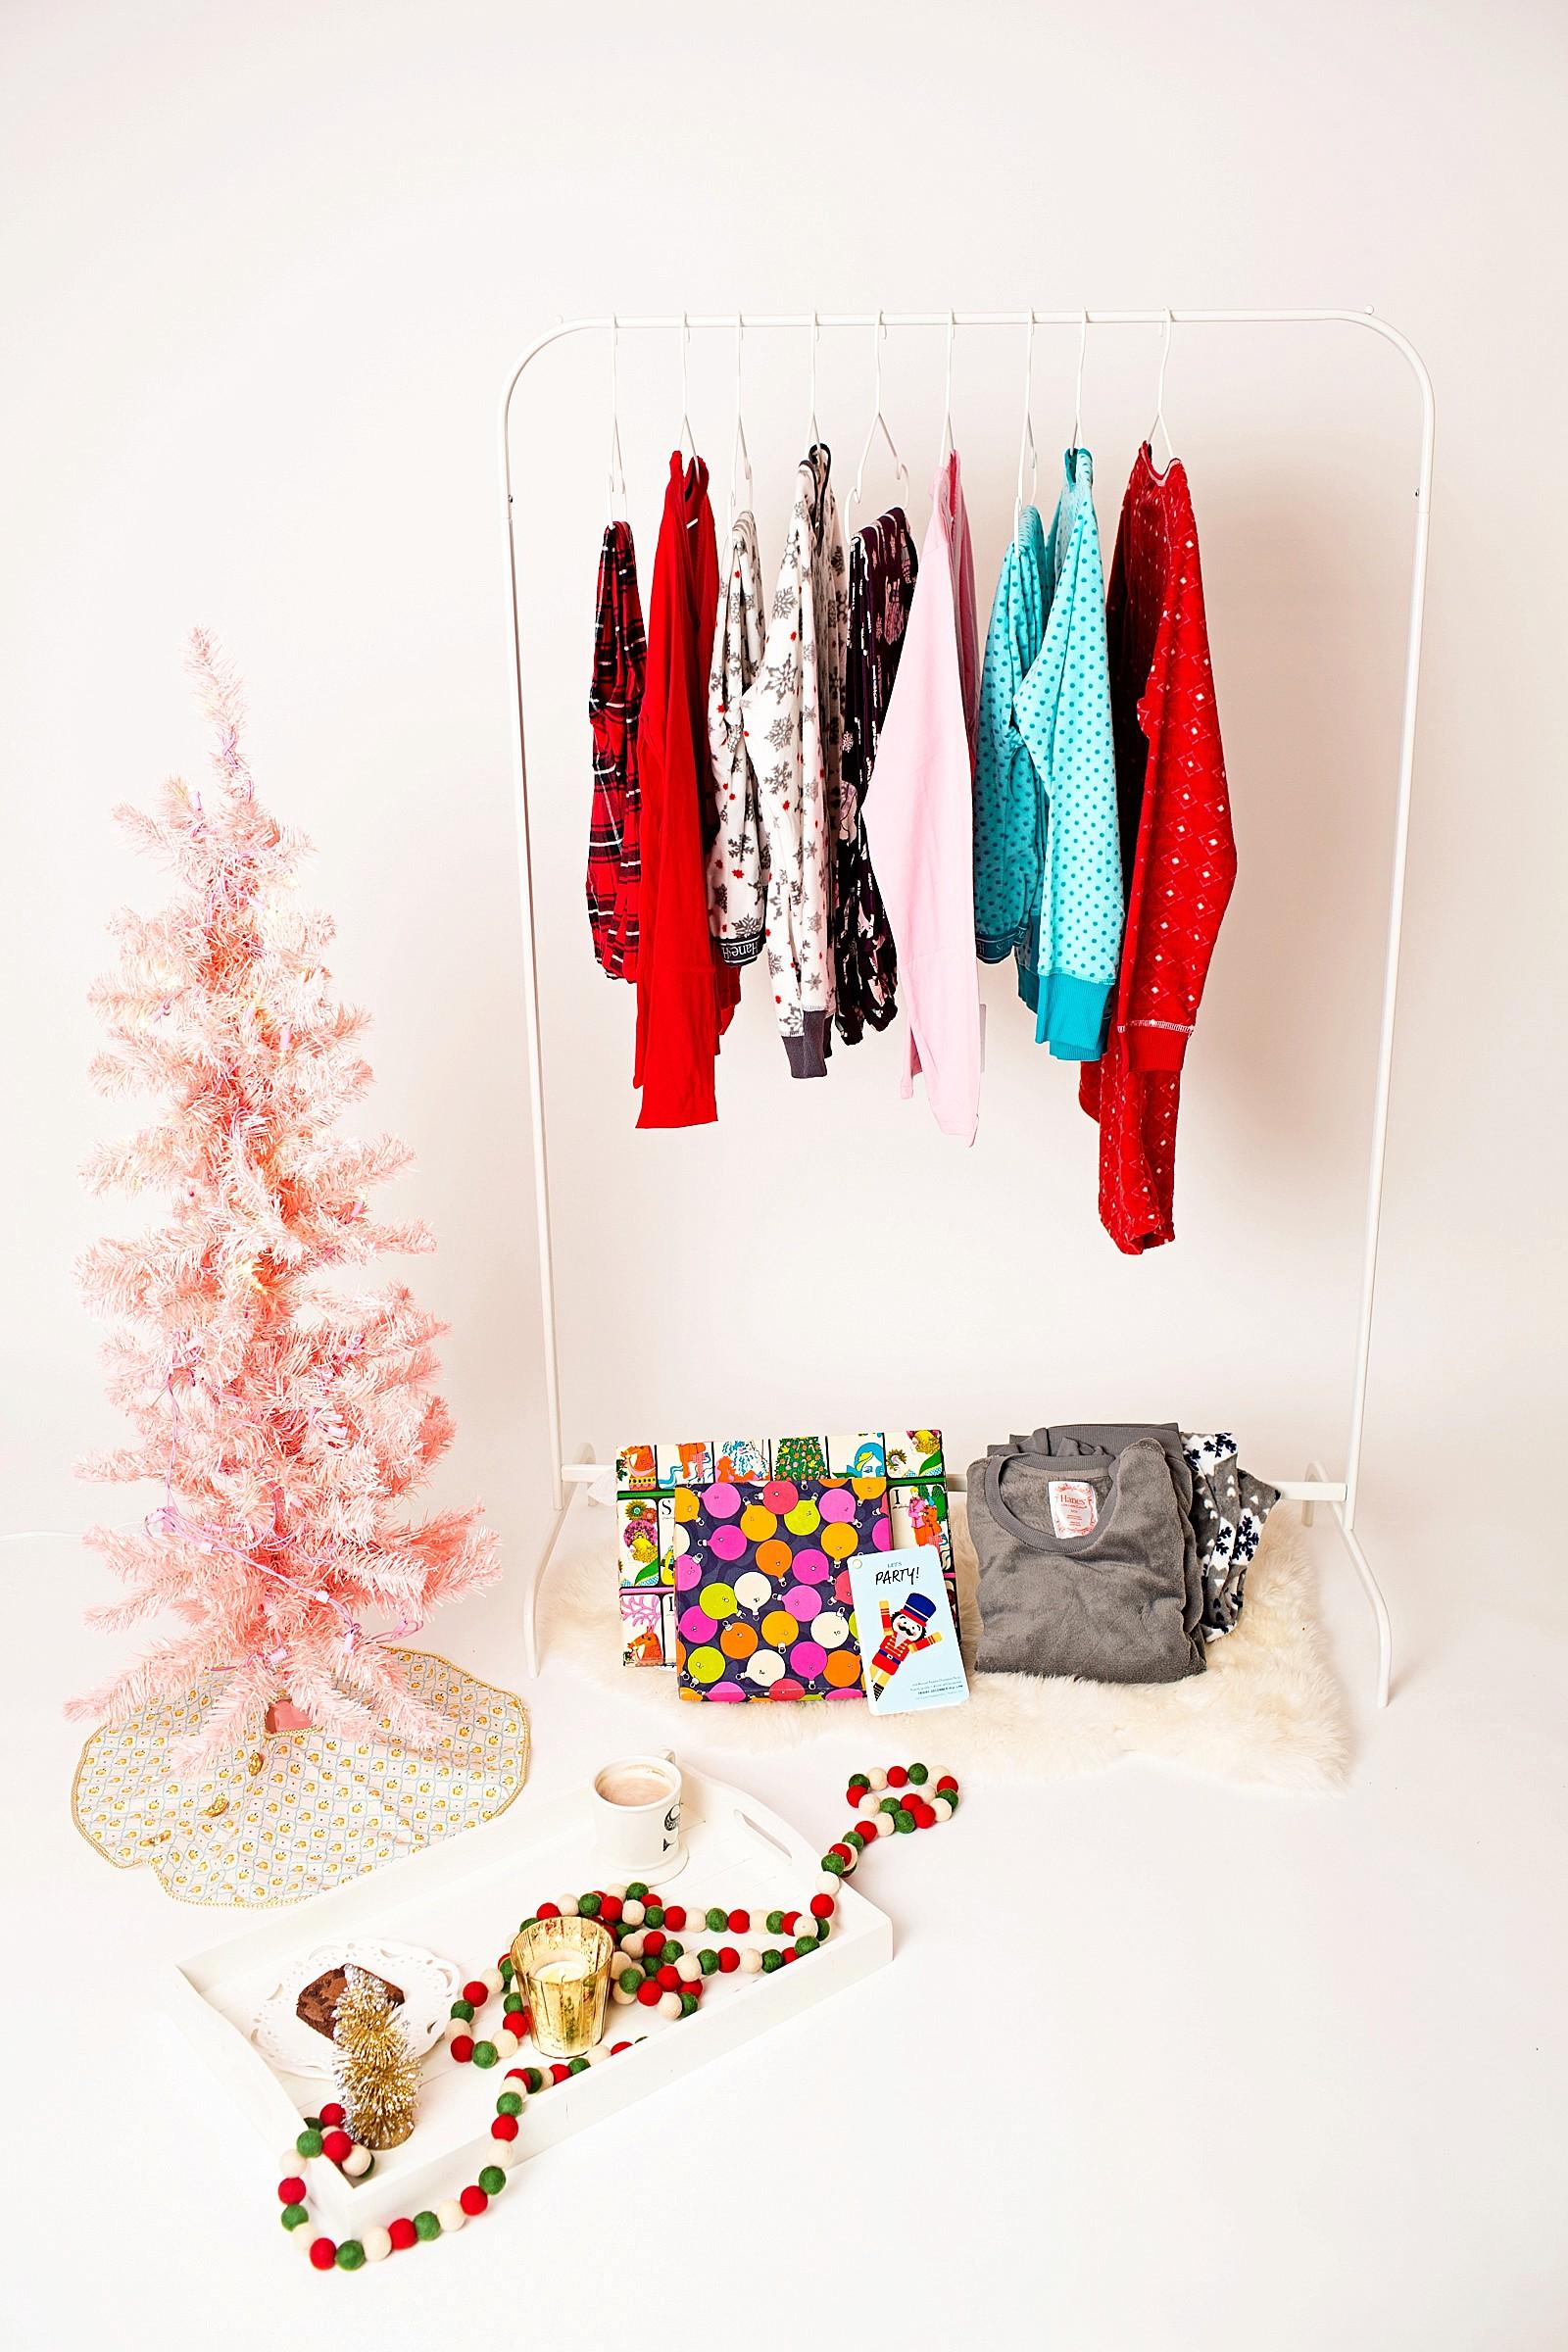 hanes-christmas-pajamas-girls-pajama-party-ideas-cute-jammies-diana-elizabeth-lifestyle-fashion-blogger-phoenix-arizona-1763